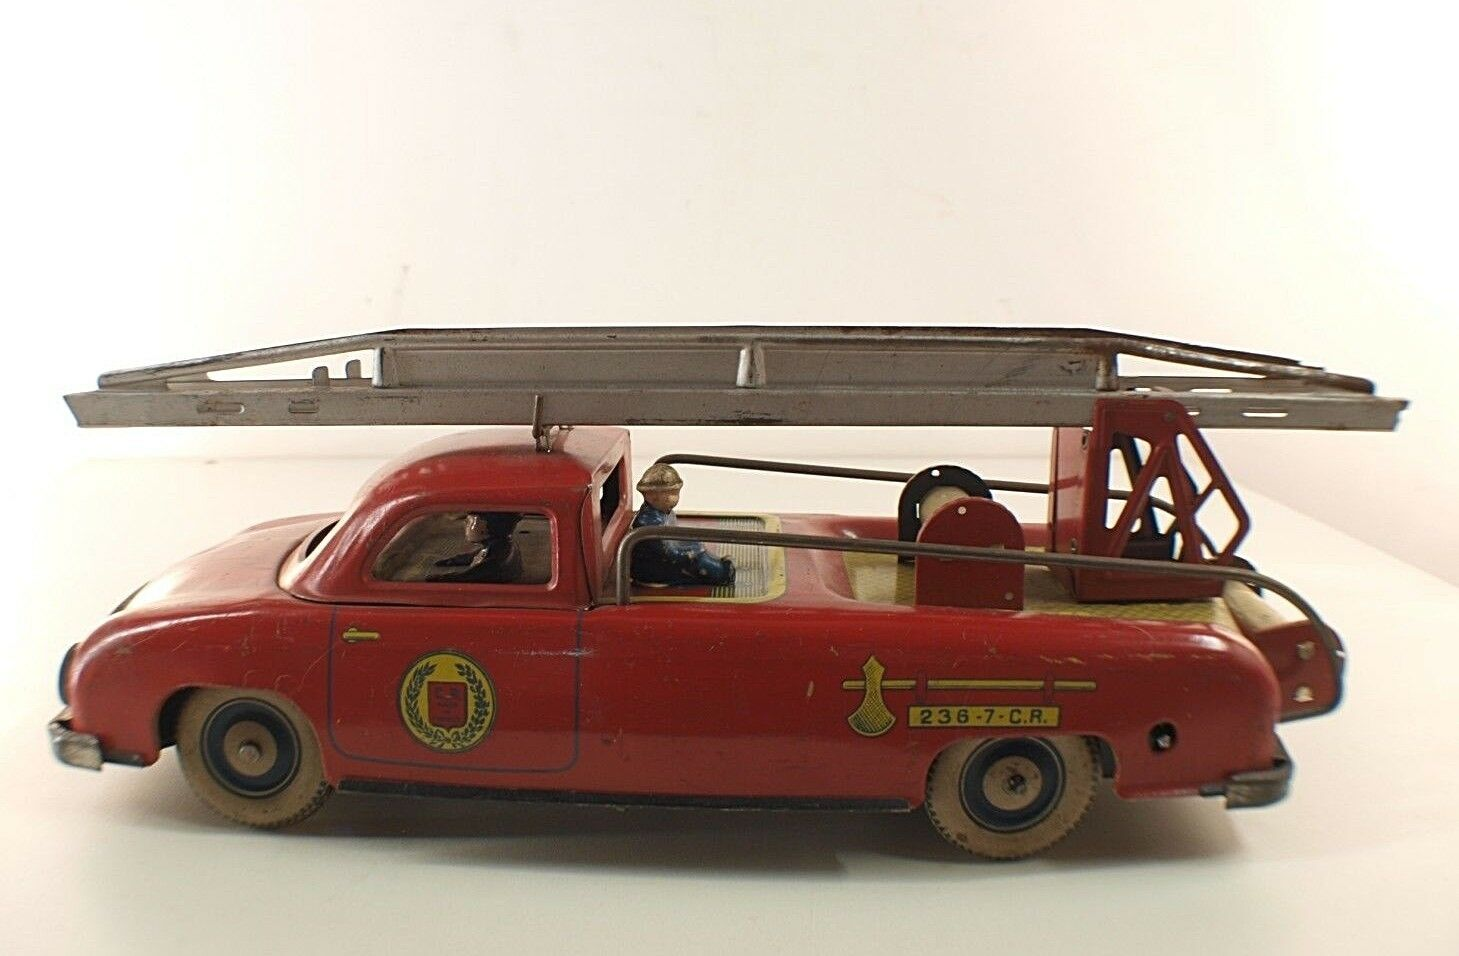 Cr charles rossignol 236-7 delahaye pompier moteur reibung t ô le tin toy selten